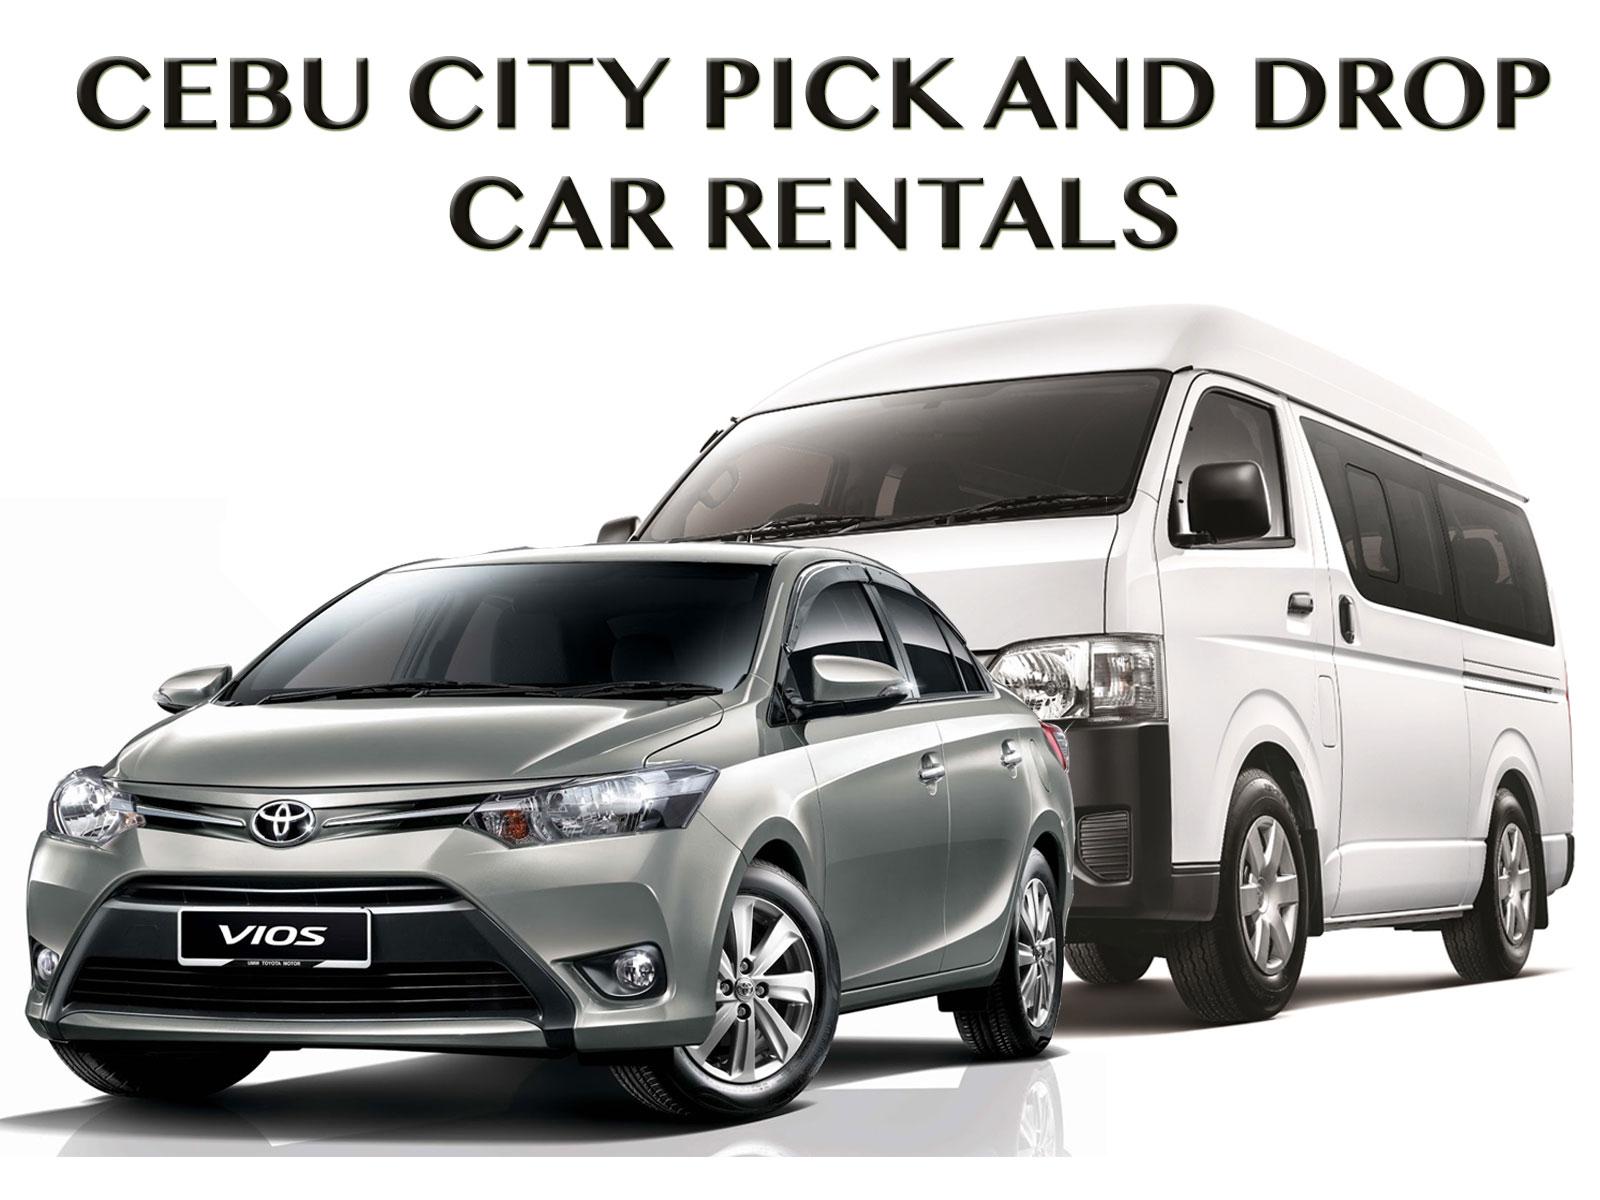 Image result for Car for Rent in Cebu